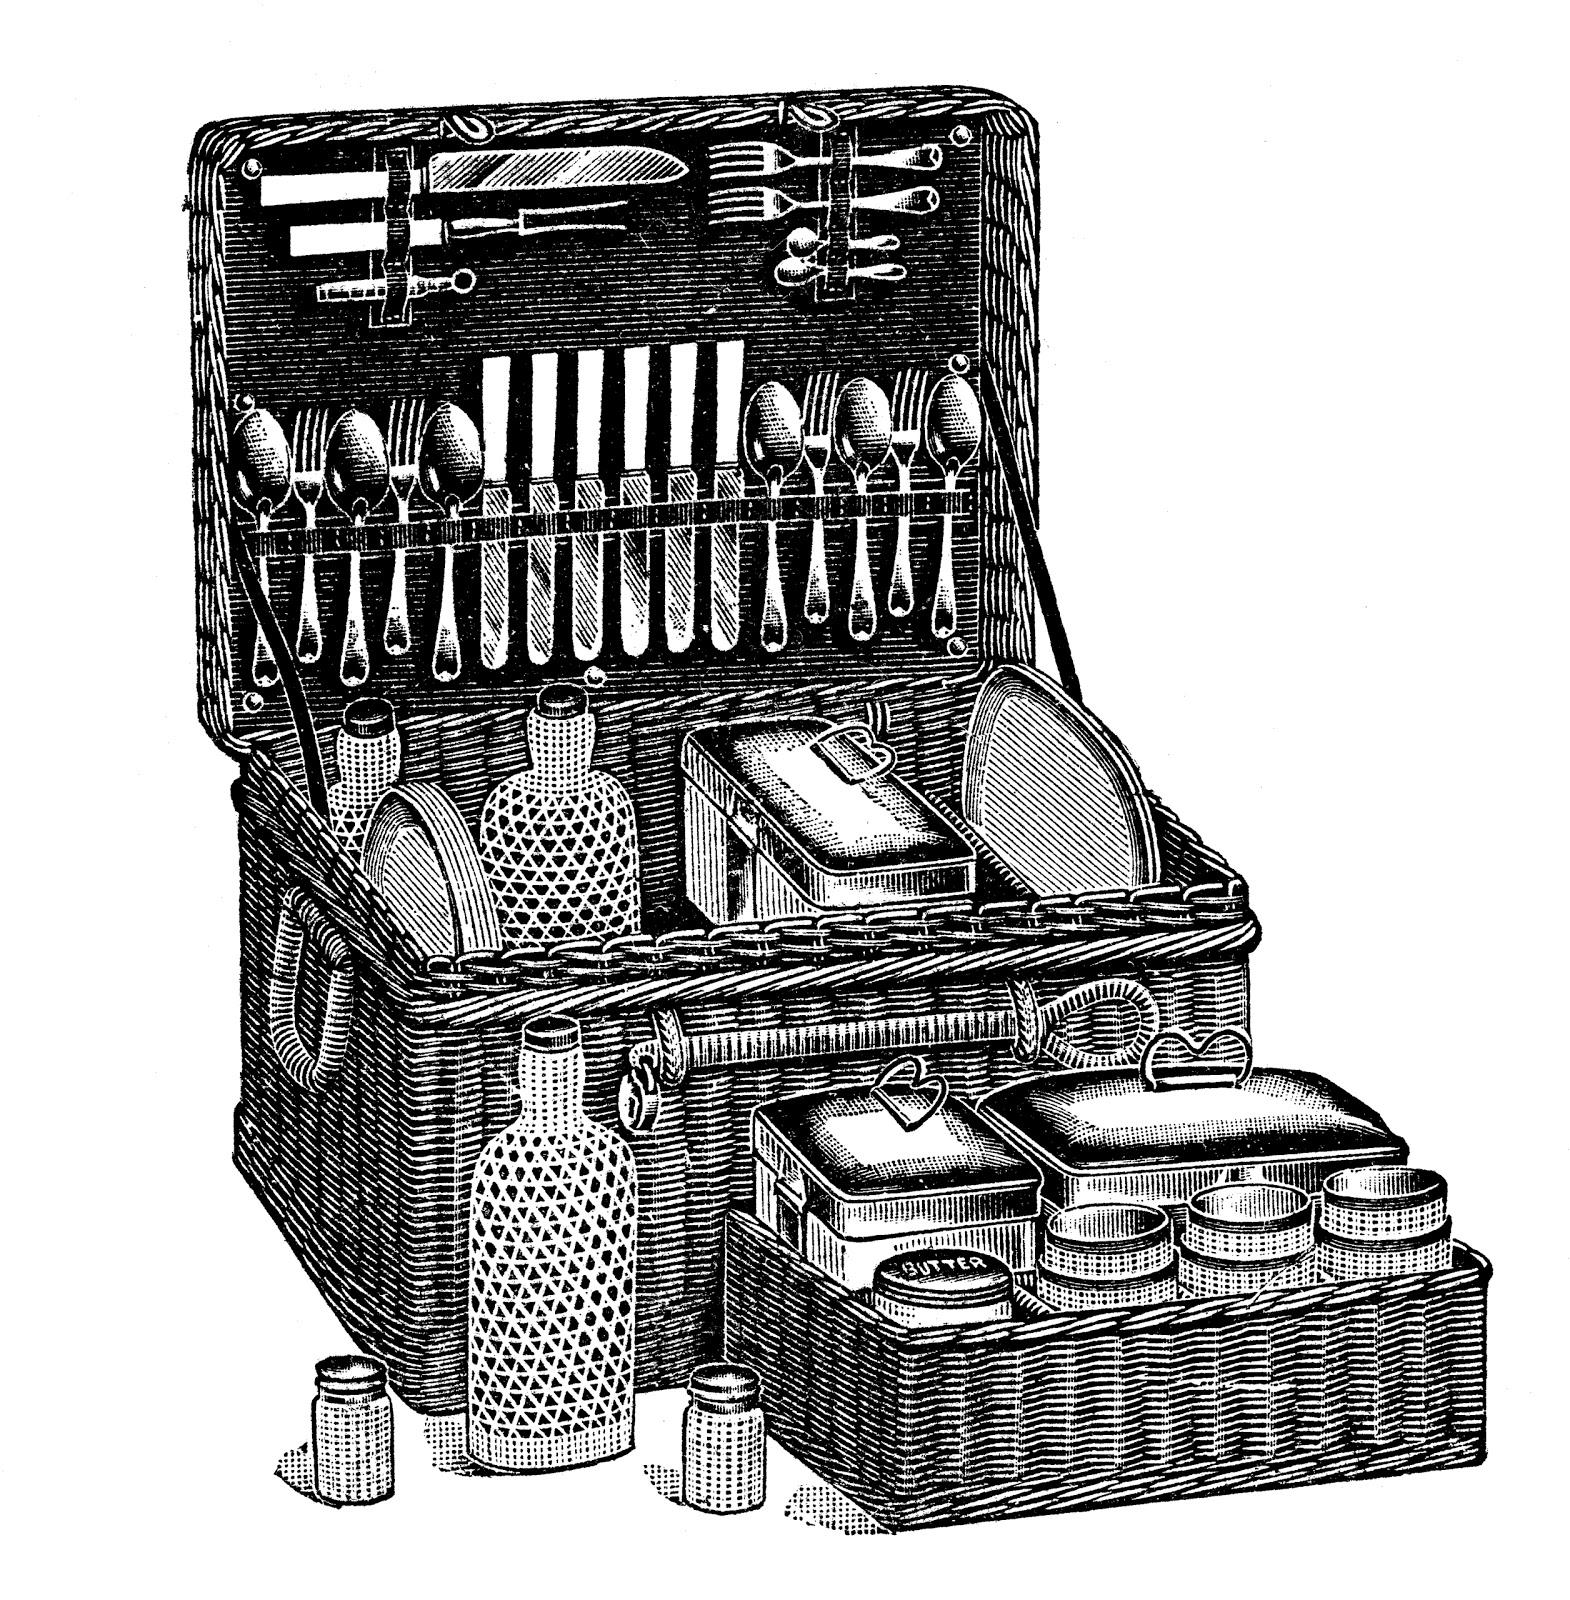 Free vintage clip art images: Vintage retro picnic hamper ...